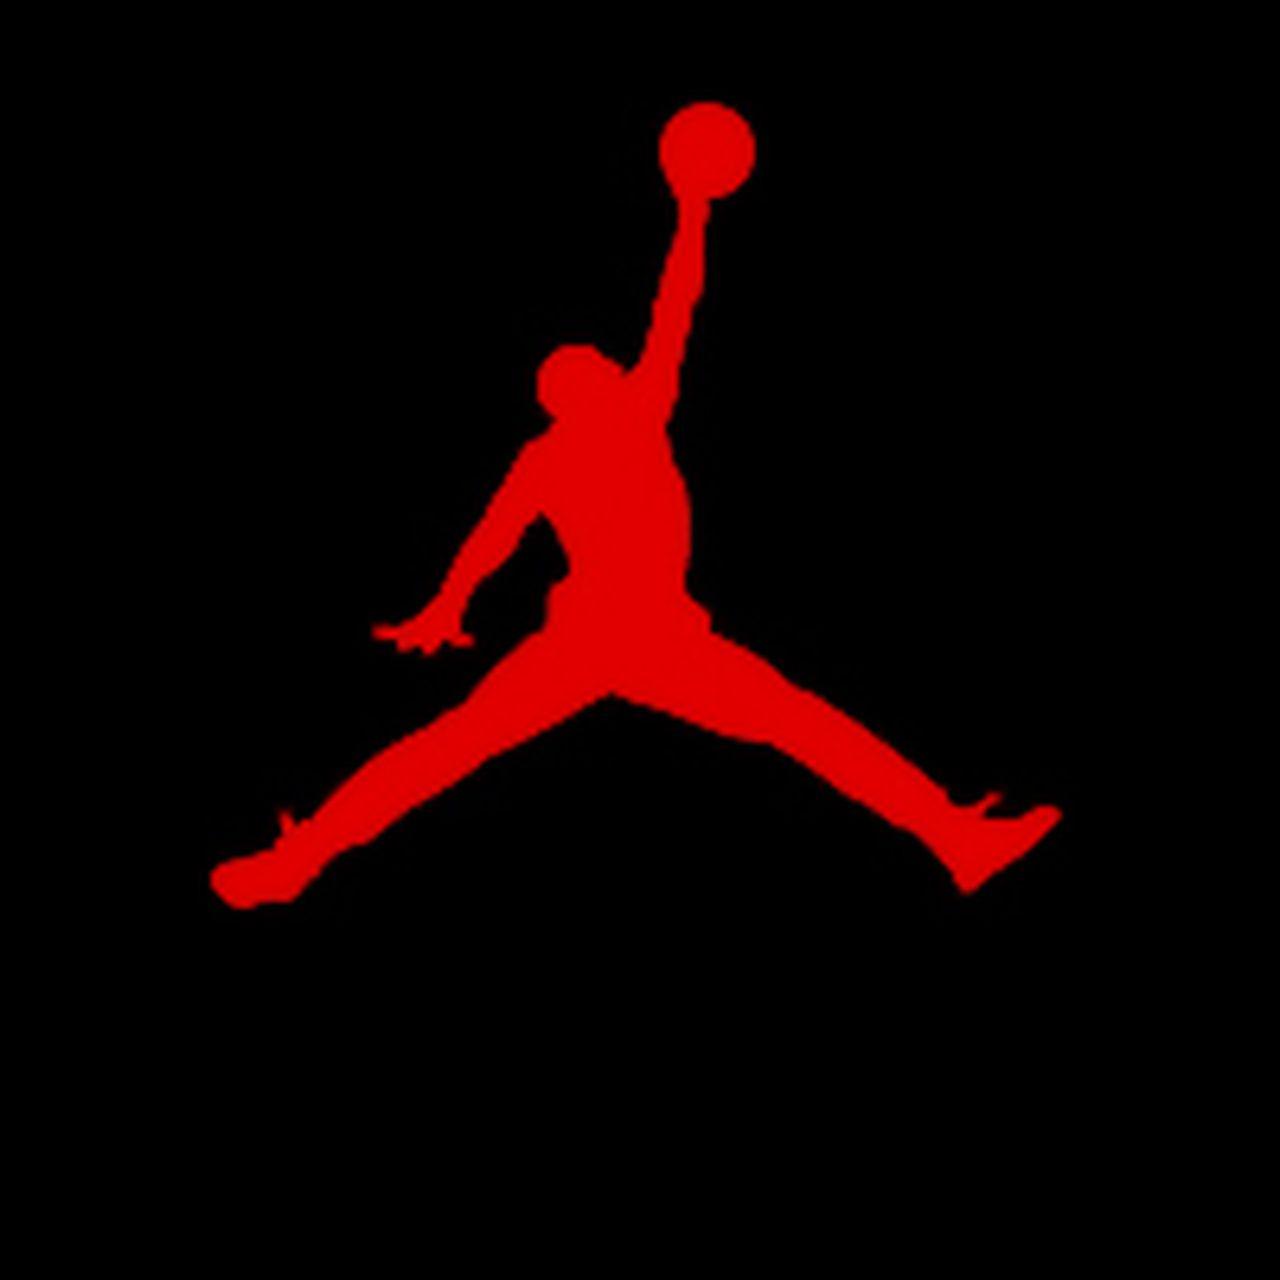 Jordan shoes never had a pair want a pair so bad